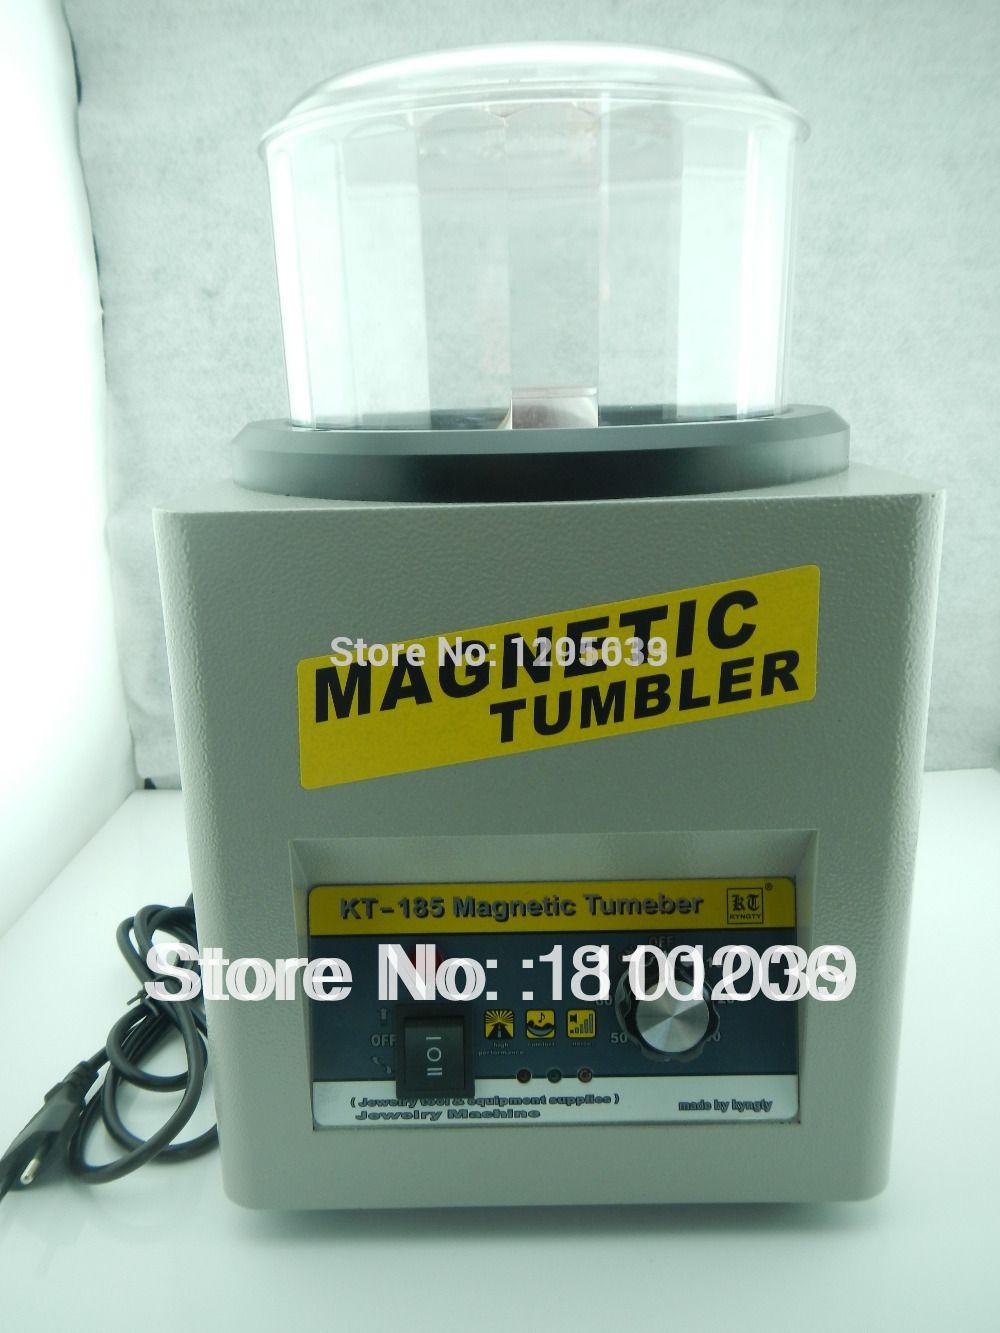 2016 KOSTENLOSER VERSAND schmuck tumbler T185 Magnetic Tumbler 16 cm Schmucksache-poliersuperfinish